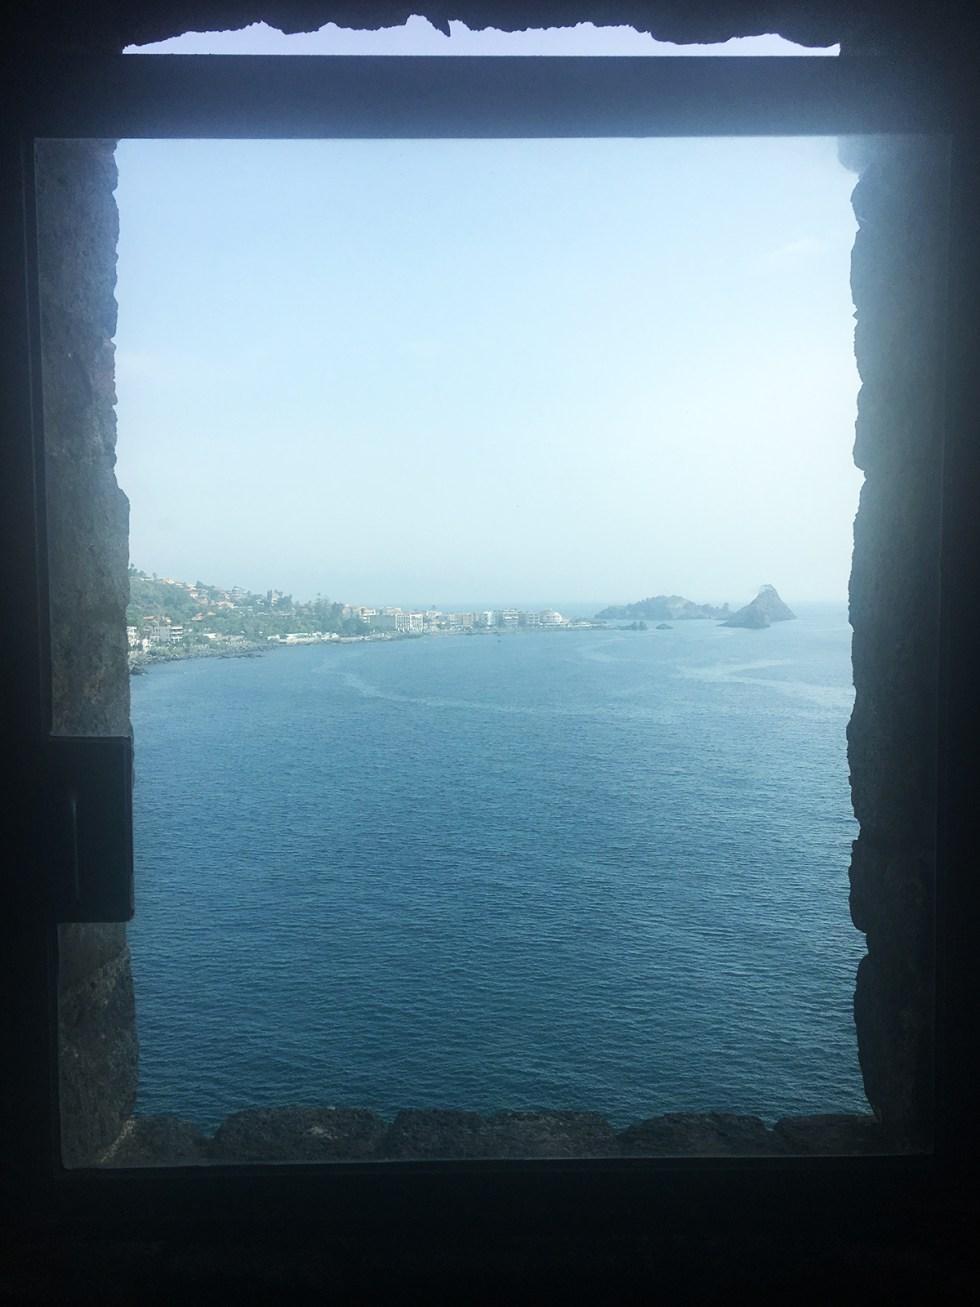 Aci Castello Sicily